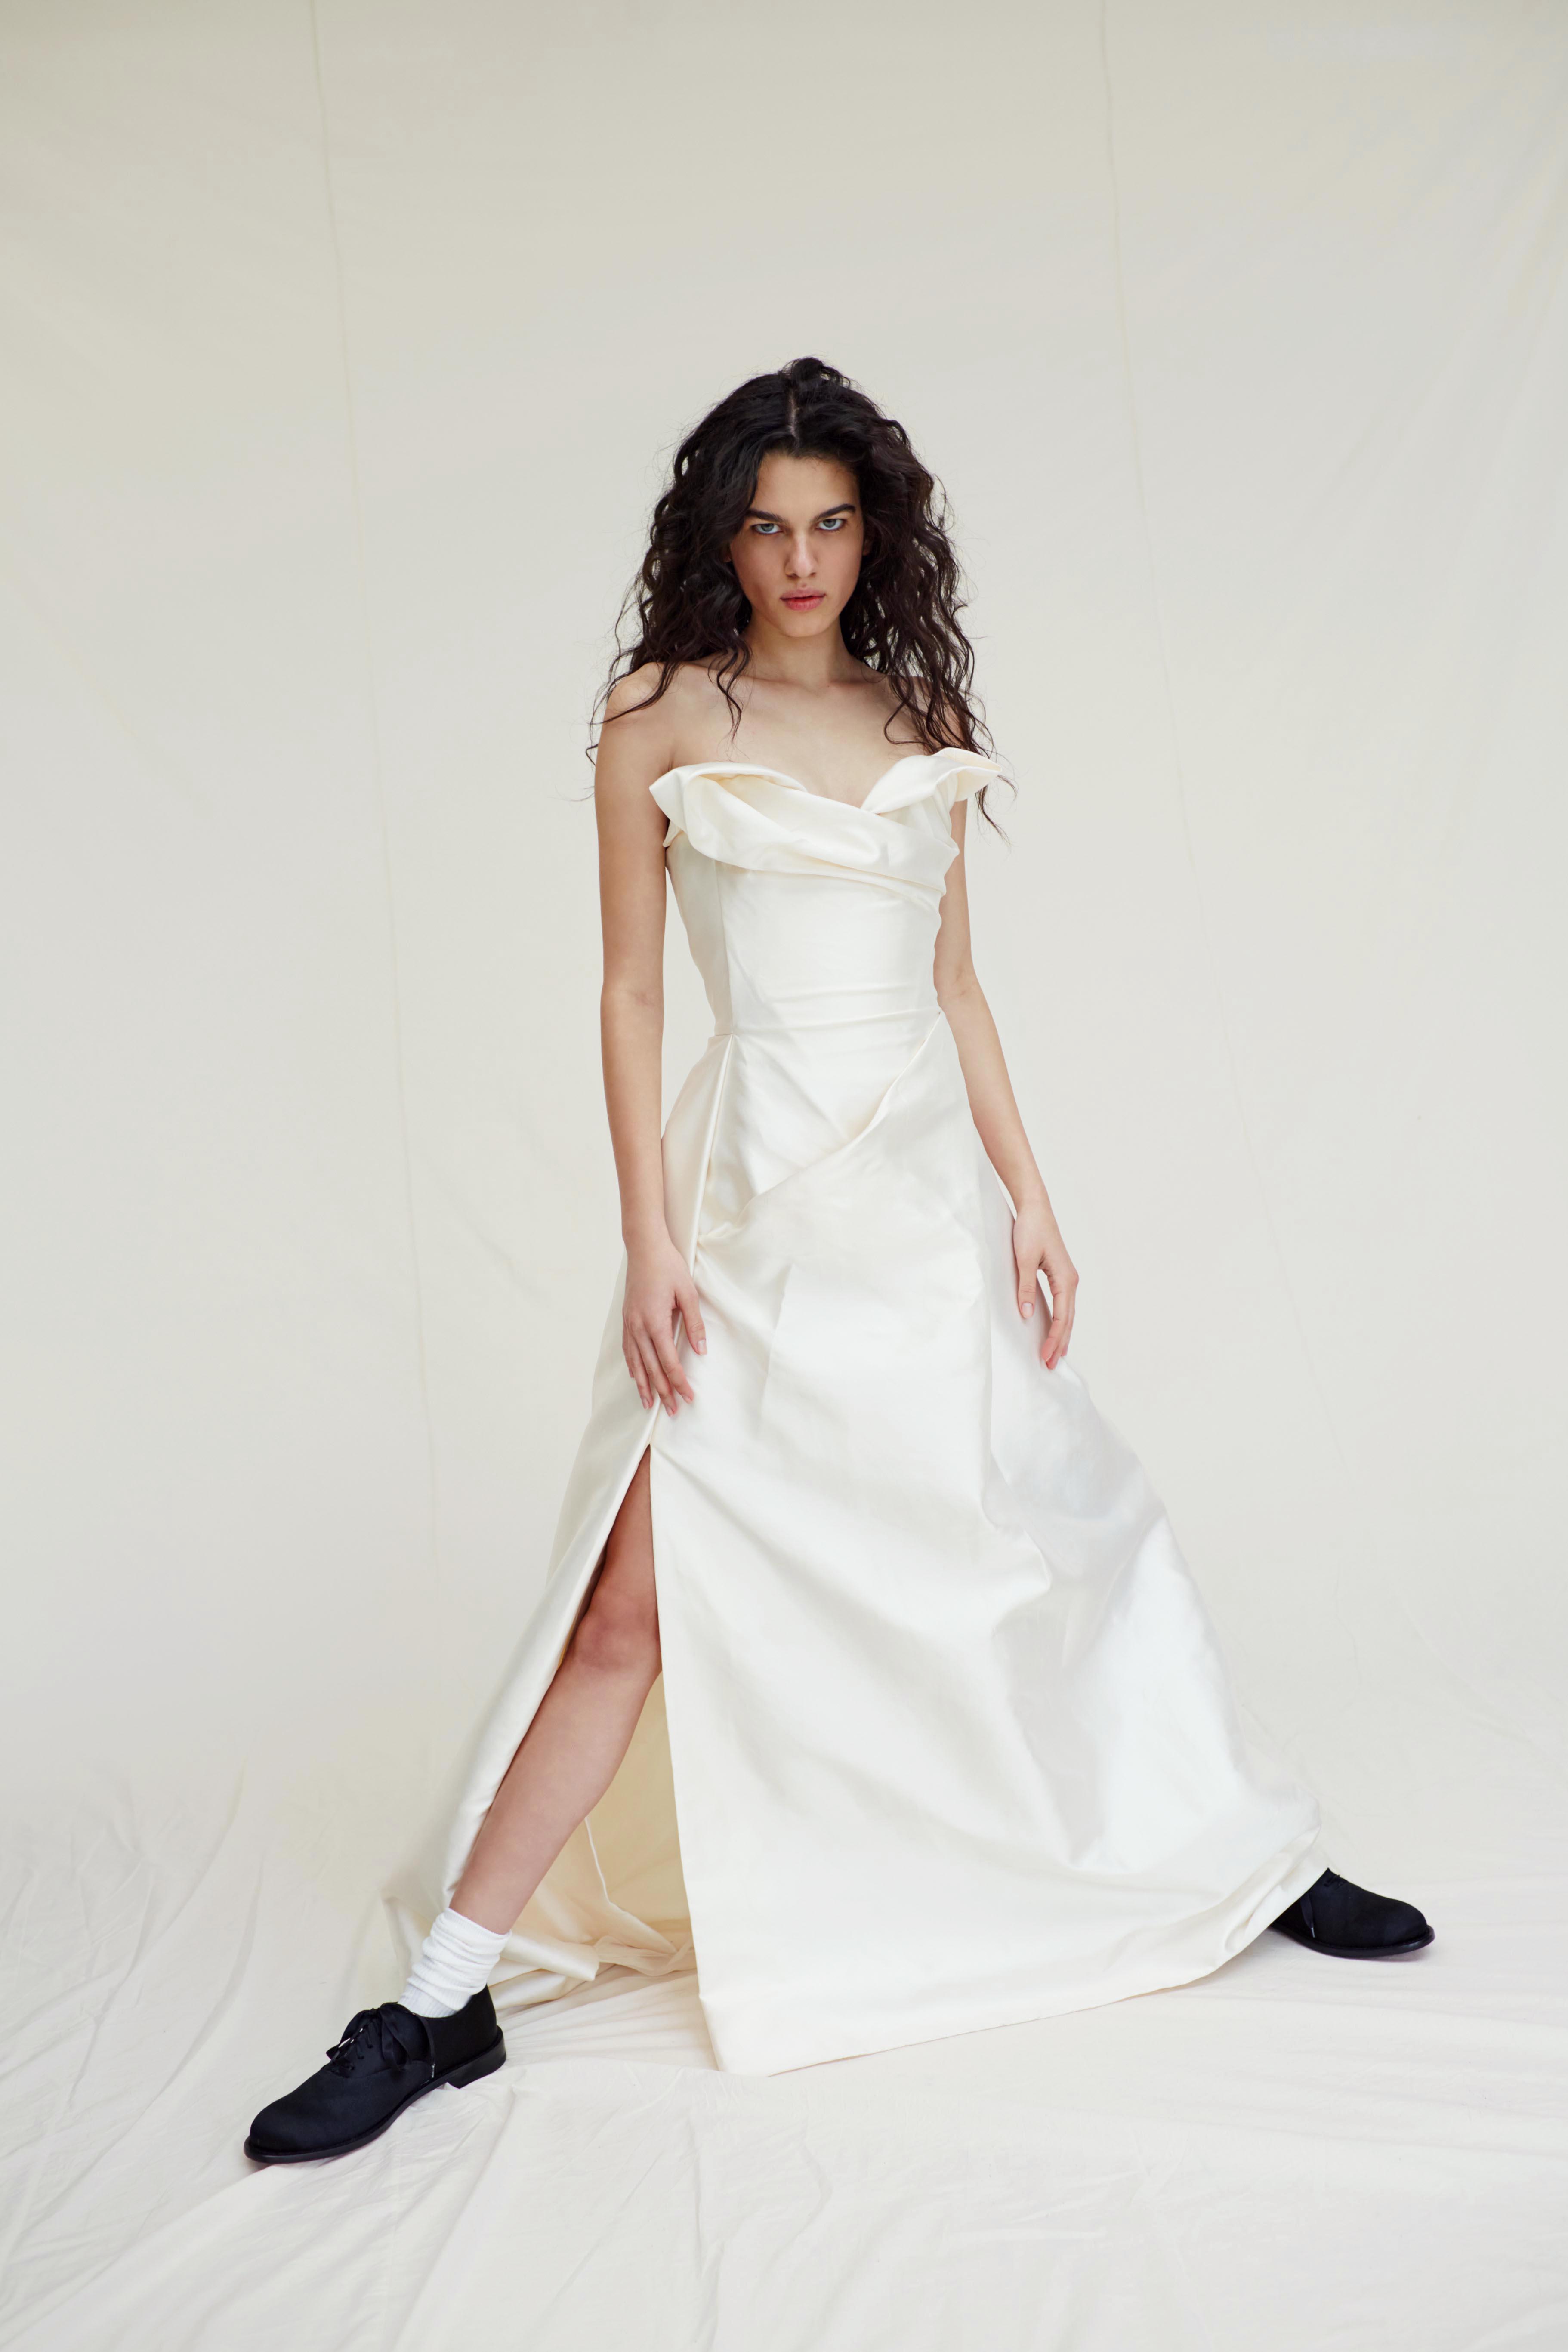 vivienne westwood wedding dress Spring 2019 strapless a-line high slit